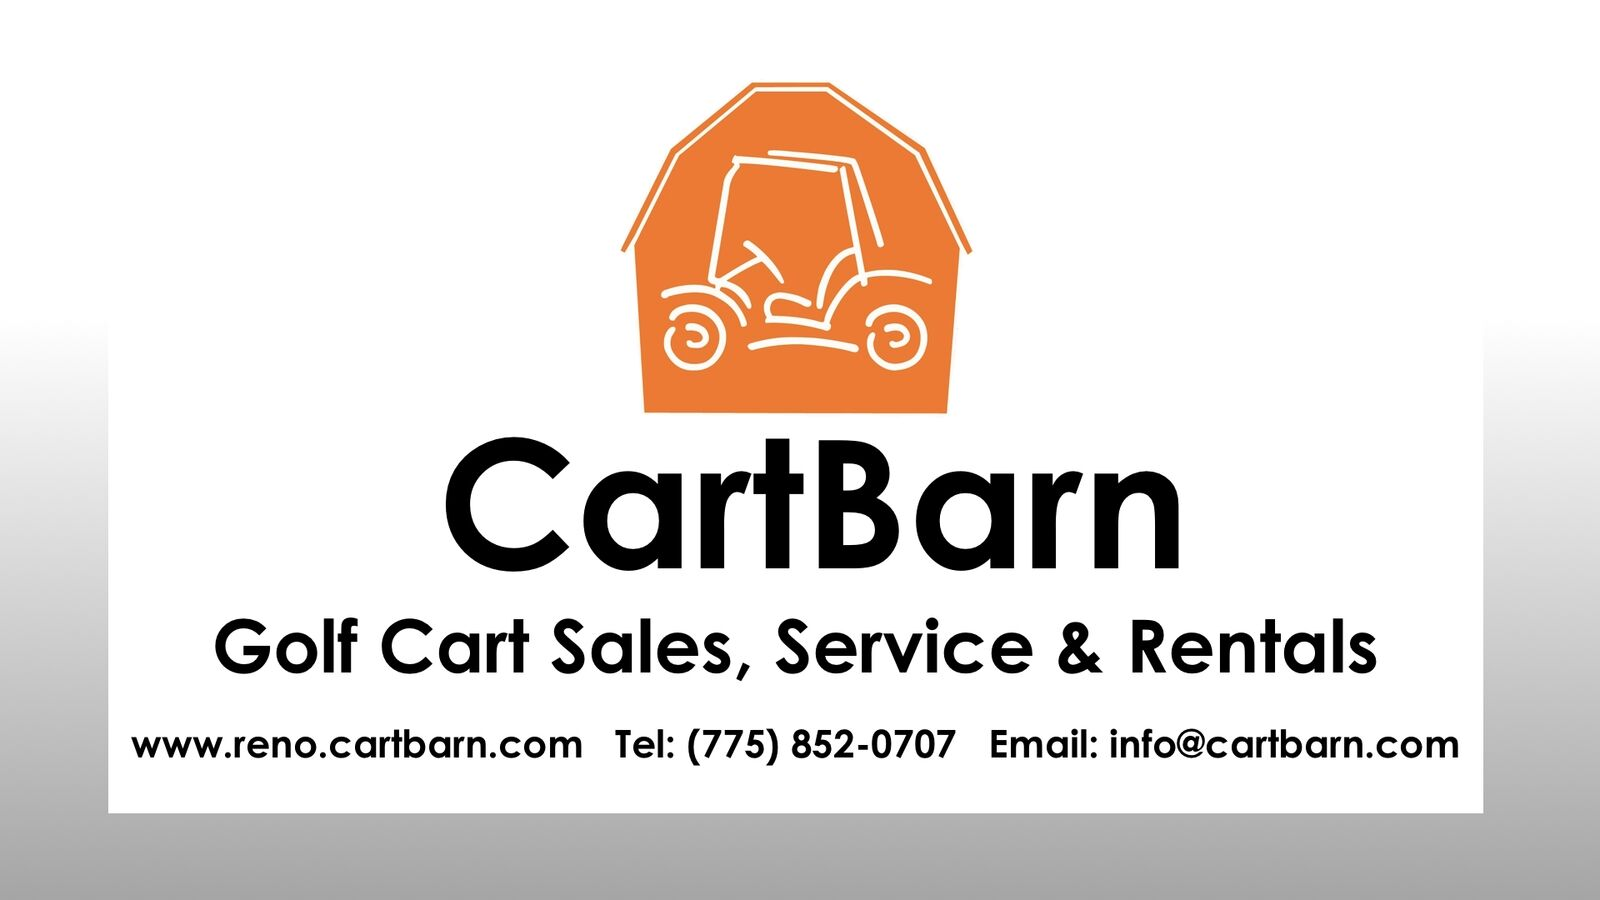 CartBarn